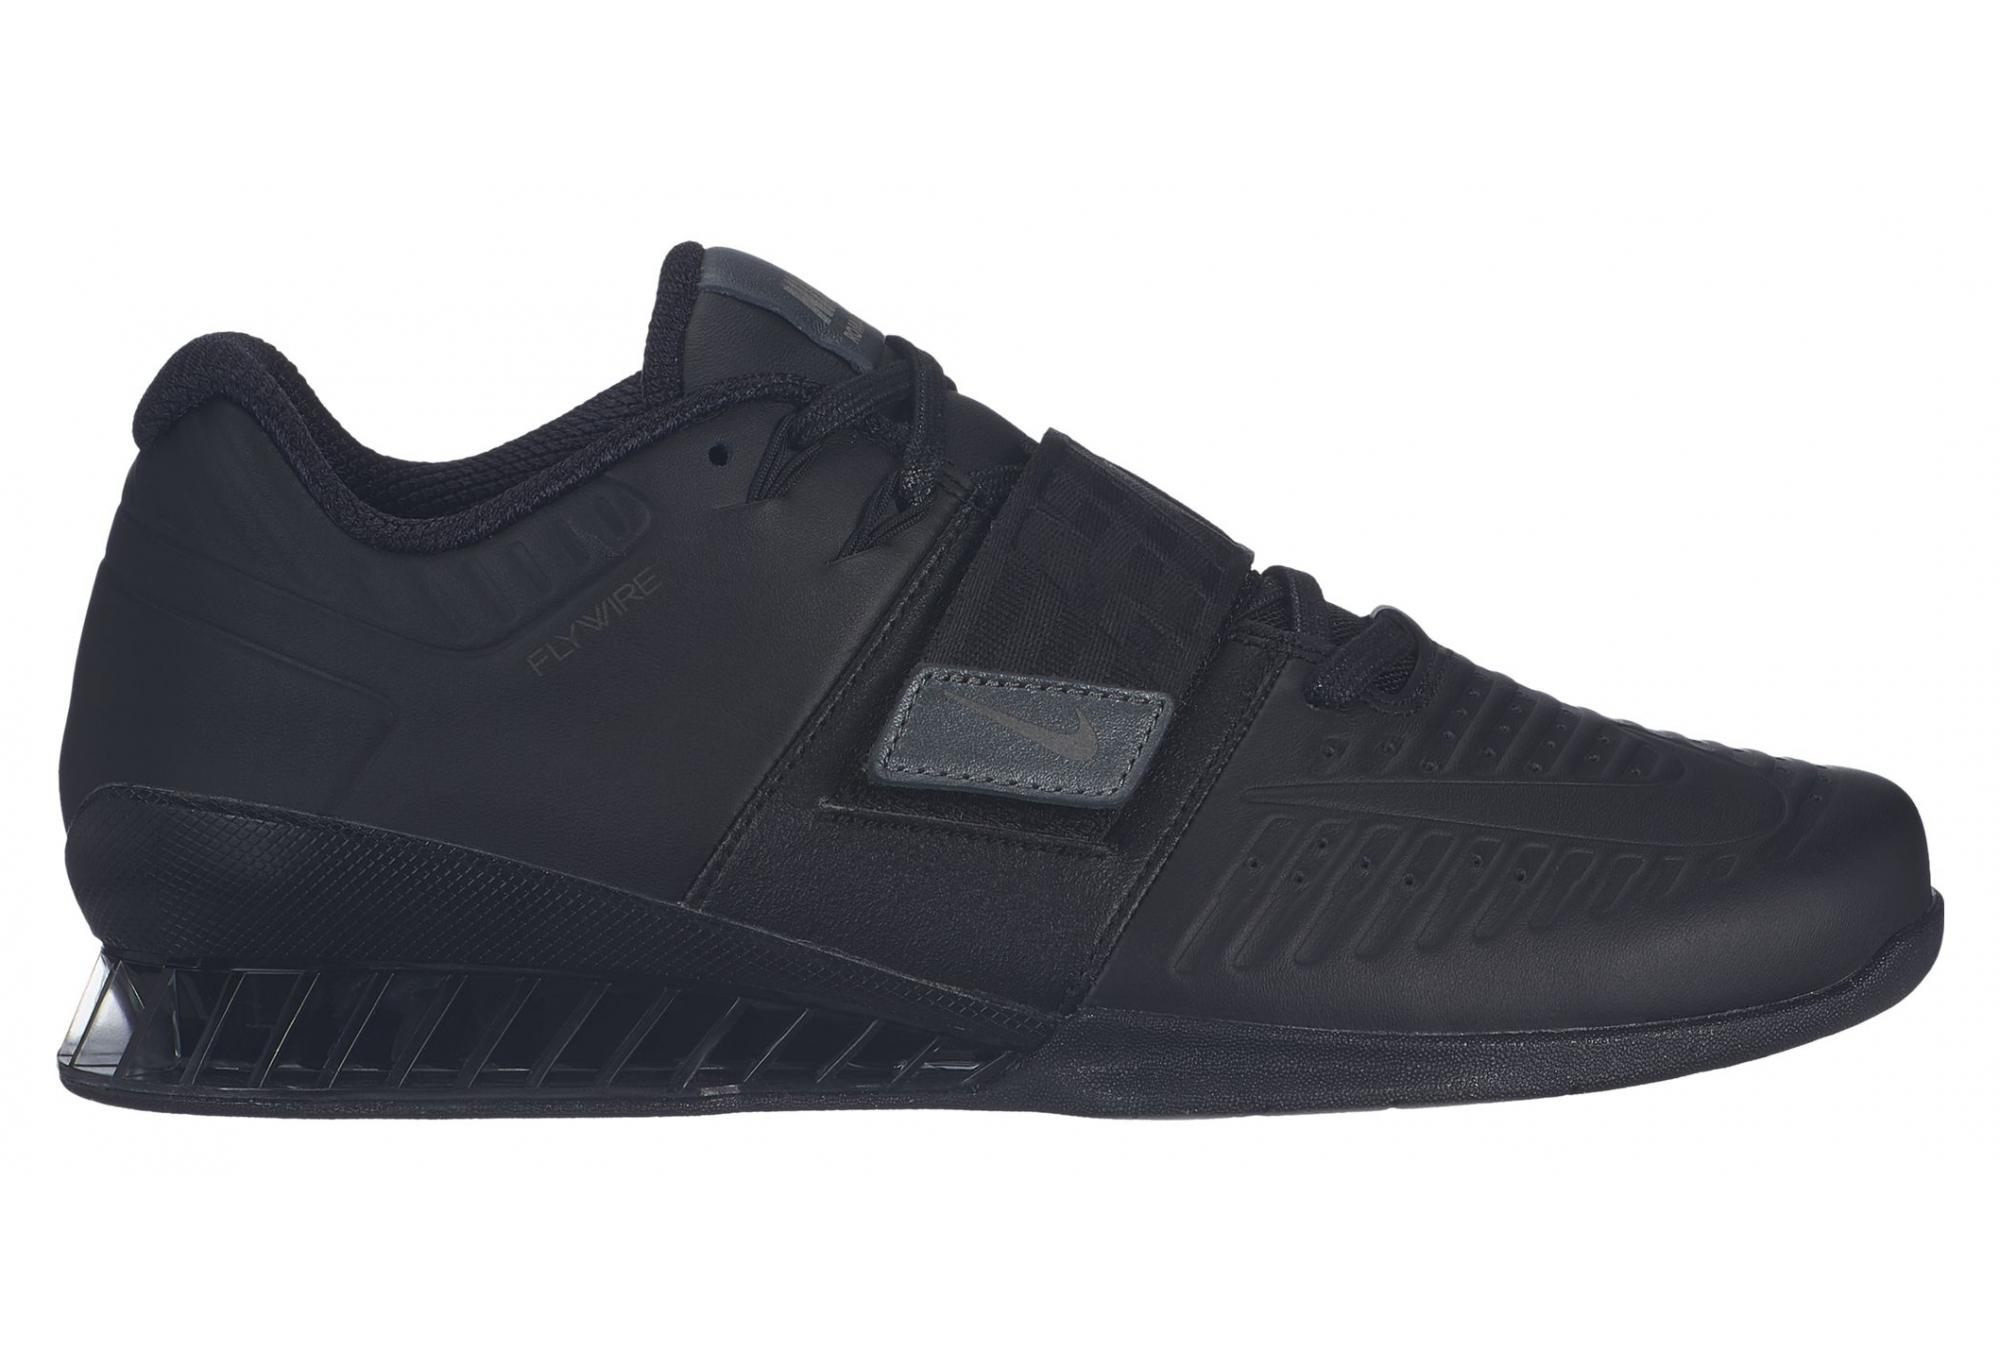 promo code ab4ce 4cfa6 Chaussures de Cross Training Nike Romaleos 3 Noir